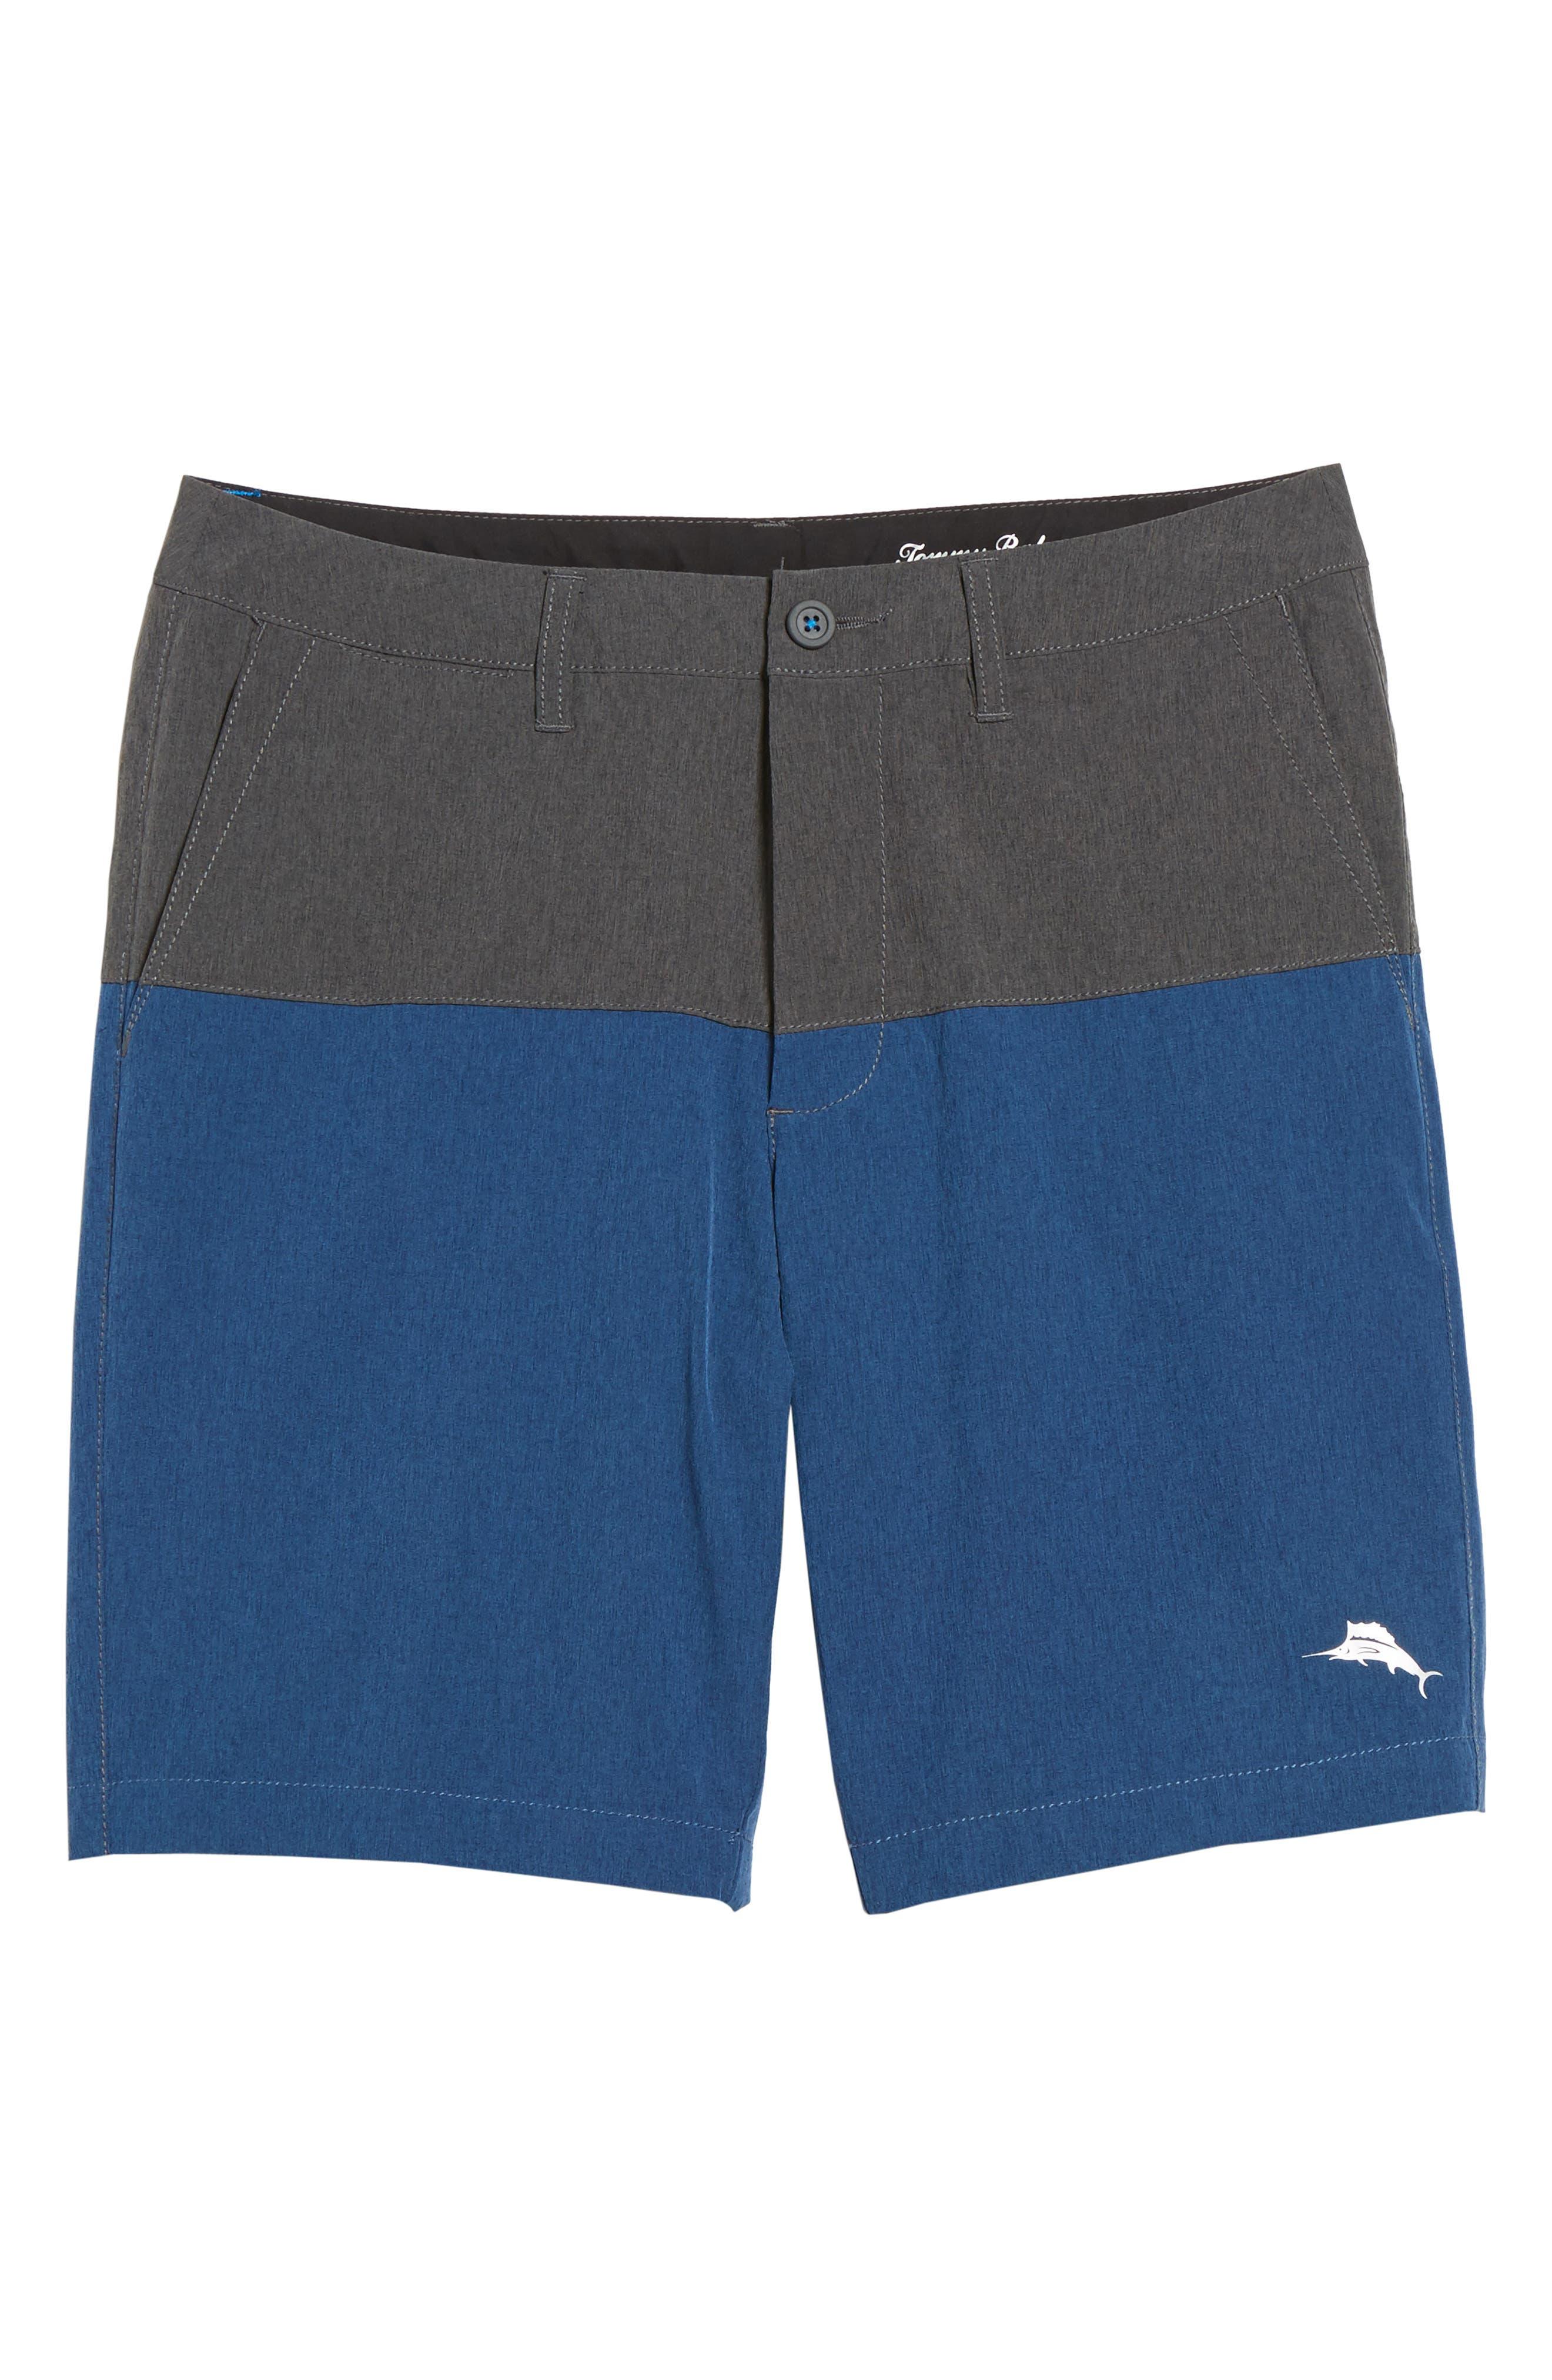 Cayman Block & Roll Hybrid Swim Shorts,                             Alternate thumbnail 6, color,                             Deep Marine